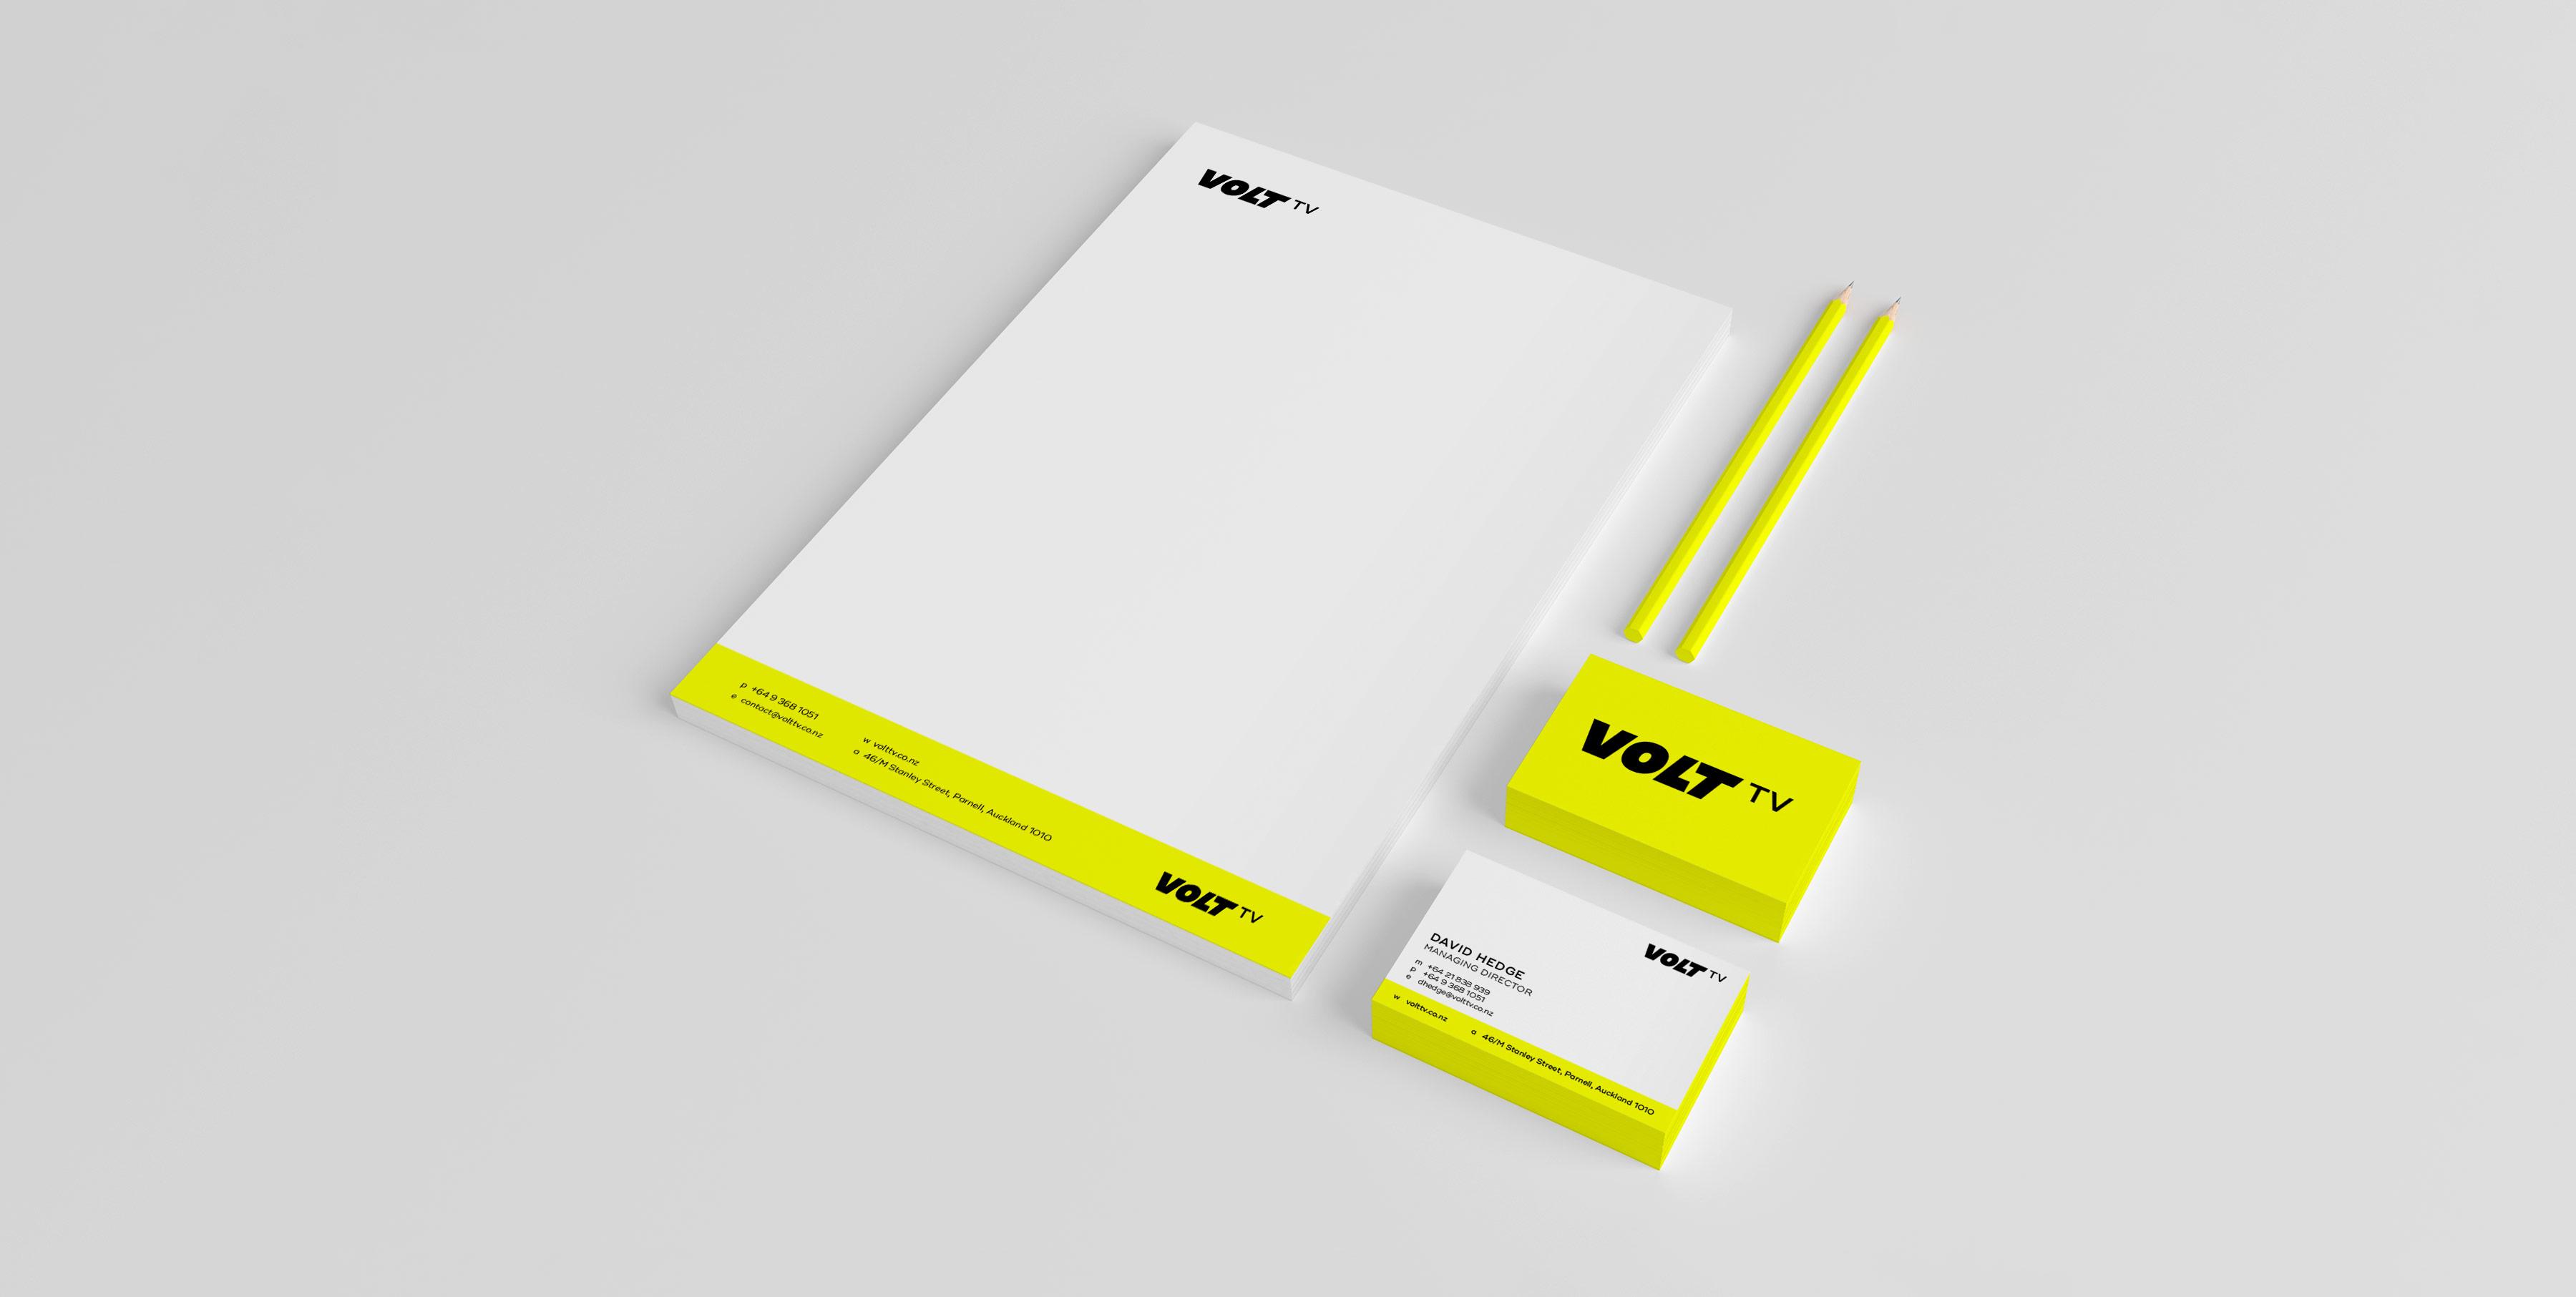 Fd2d4733 7a7c 4271 9677 4a82b1298394 company stationery bright yellow